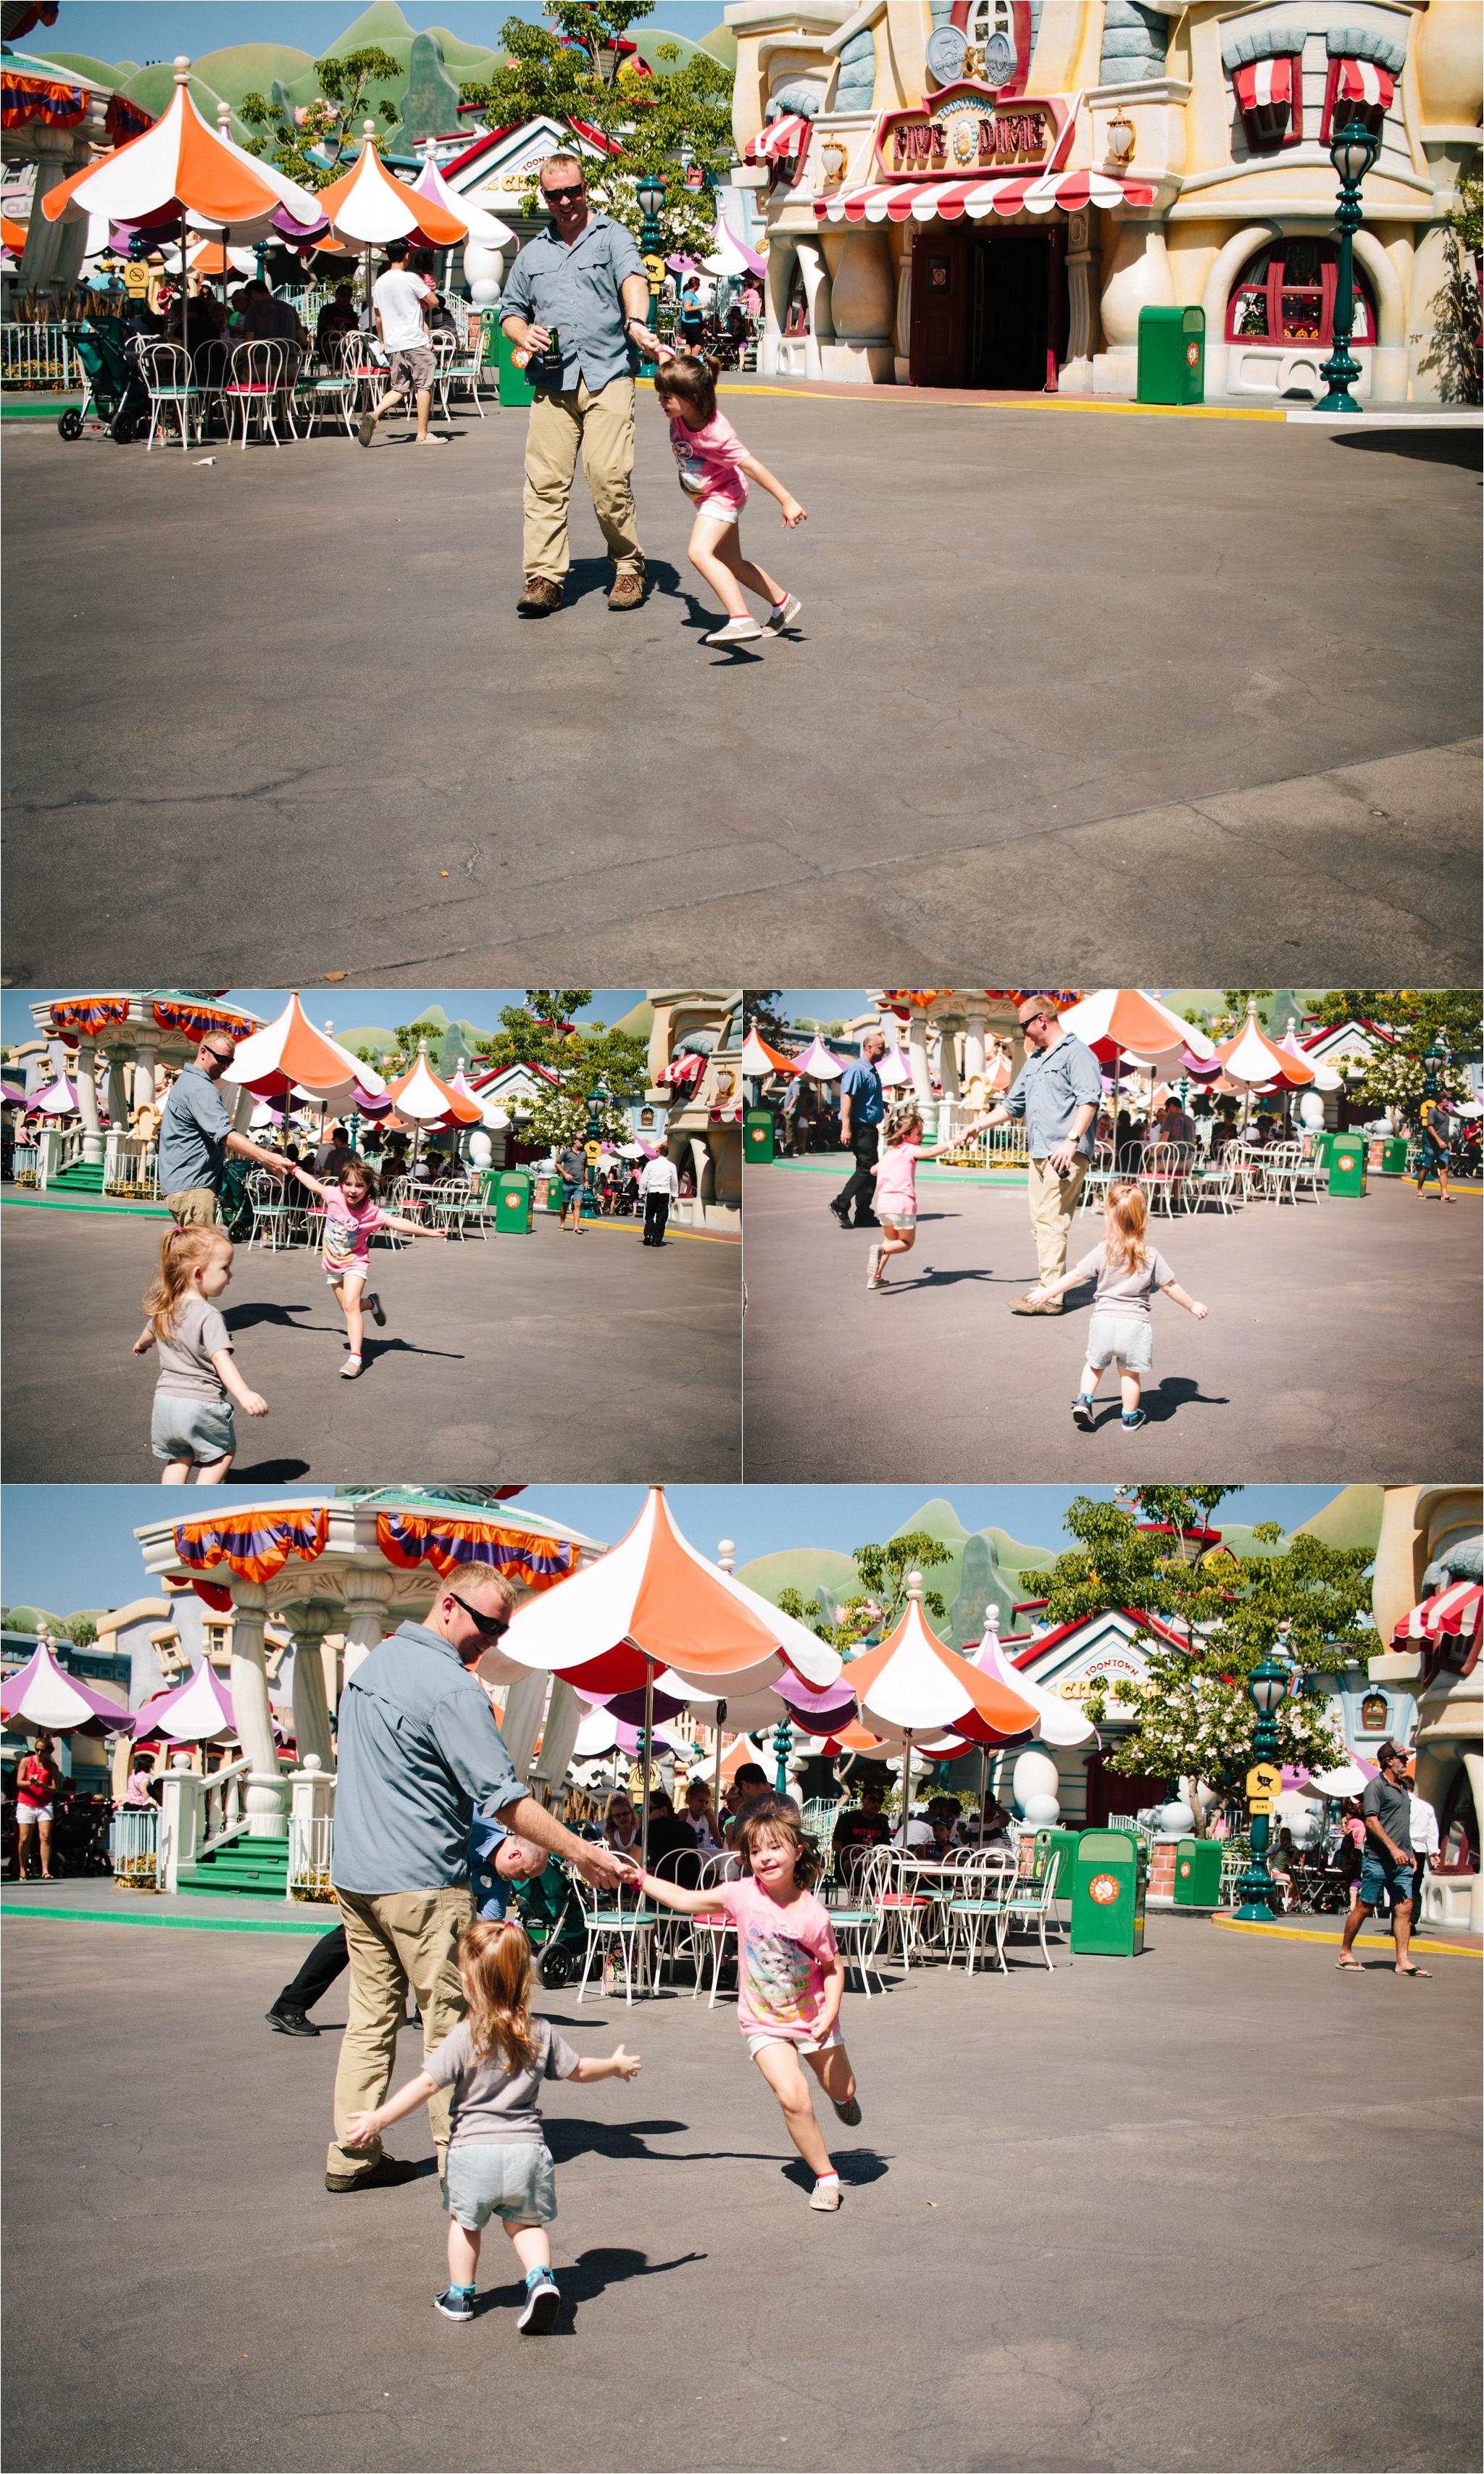 Disneylandroundtwopersonalimages_0014.jpg